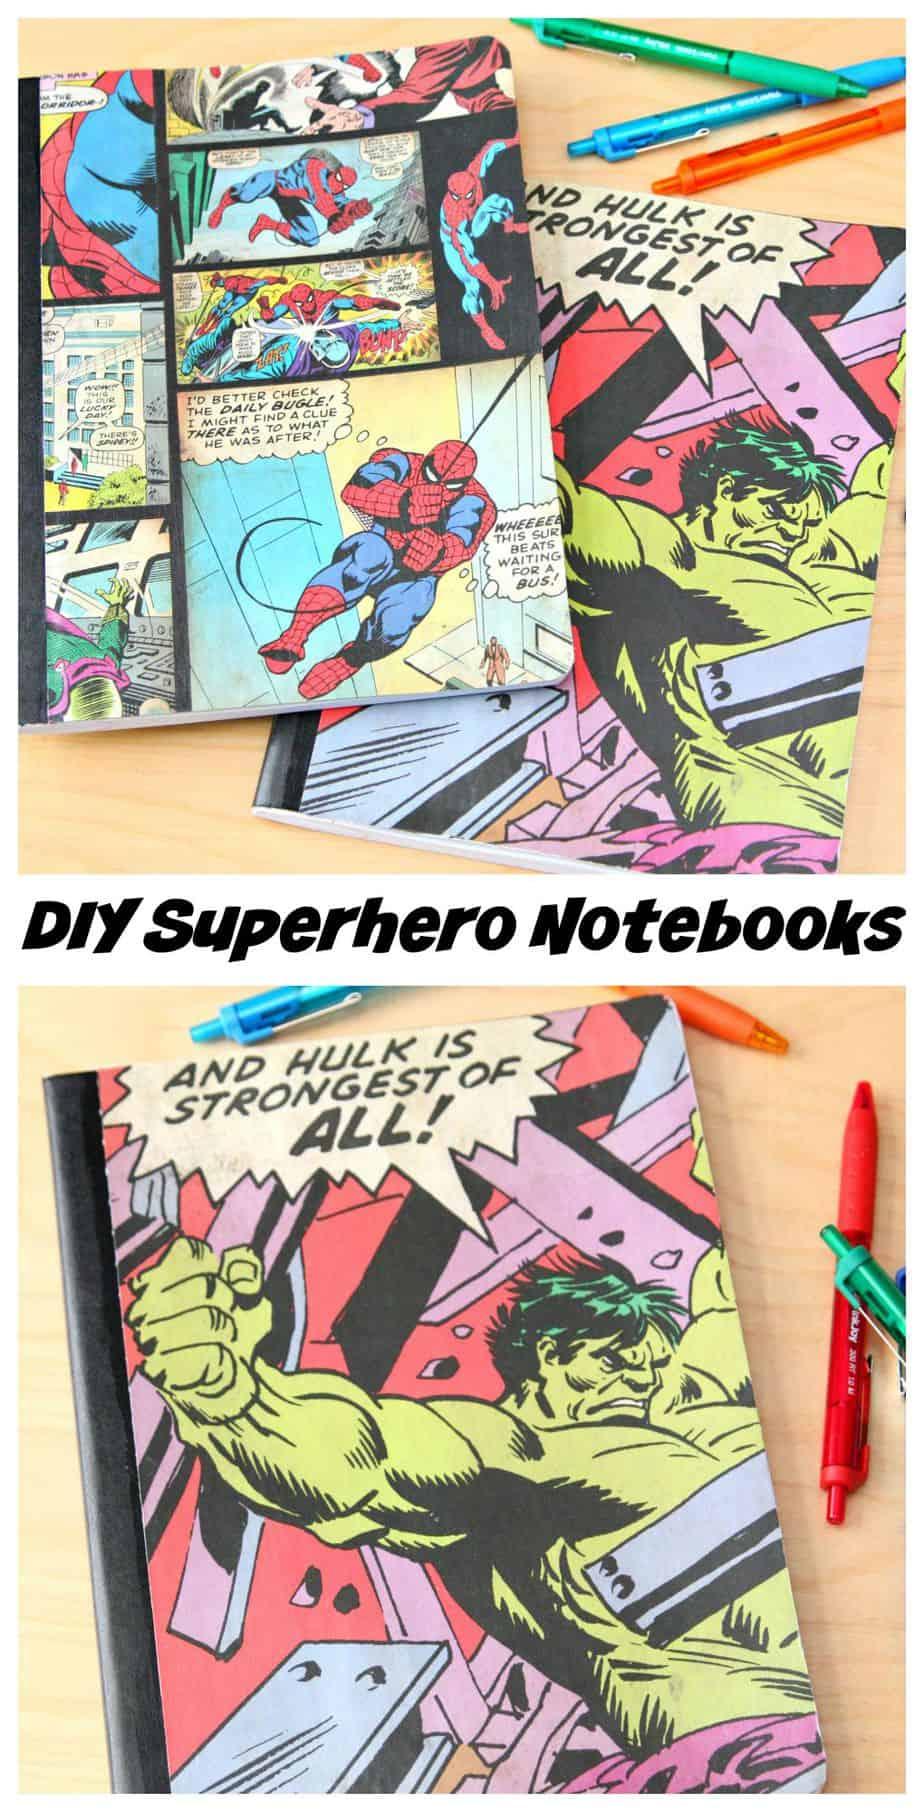 DIY Superhero Notebooks